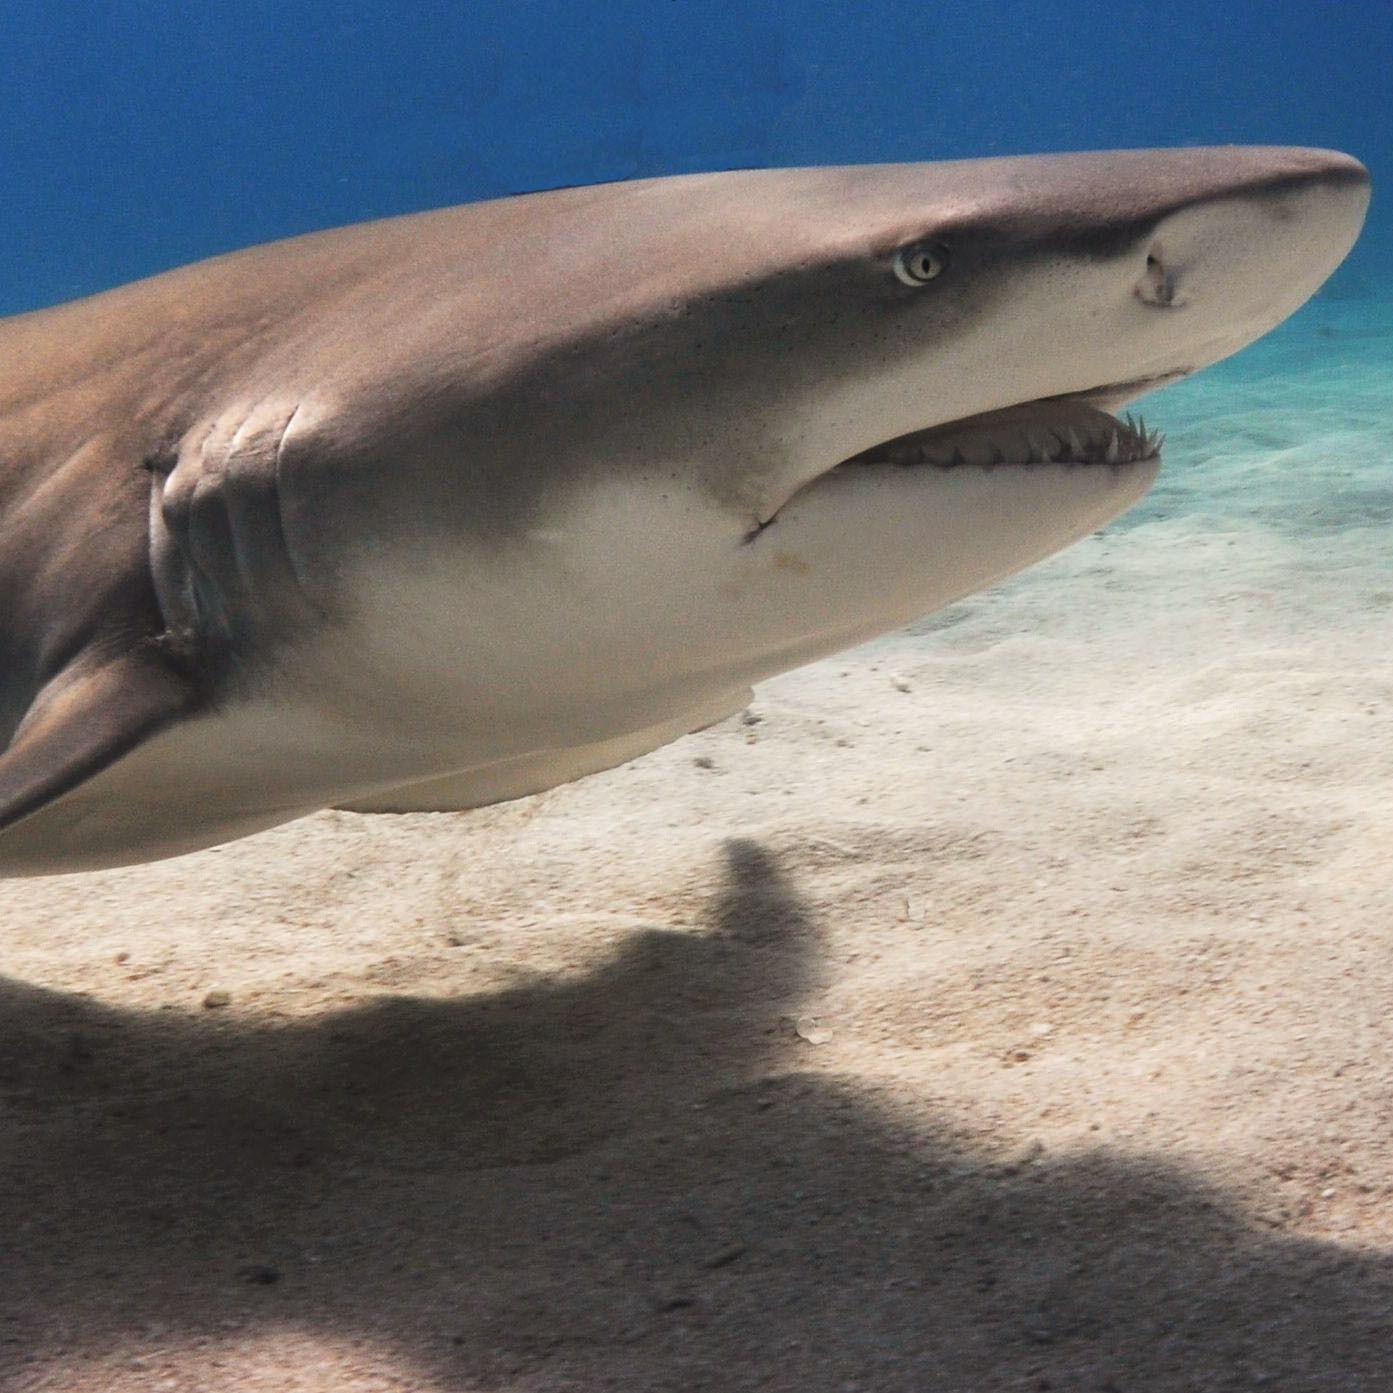 Shark dnbb3n